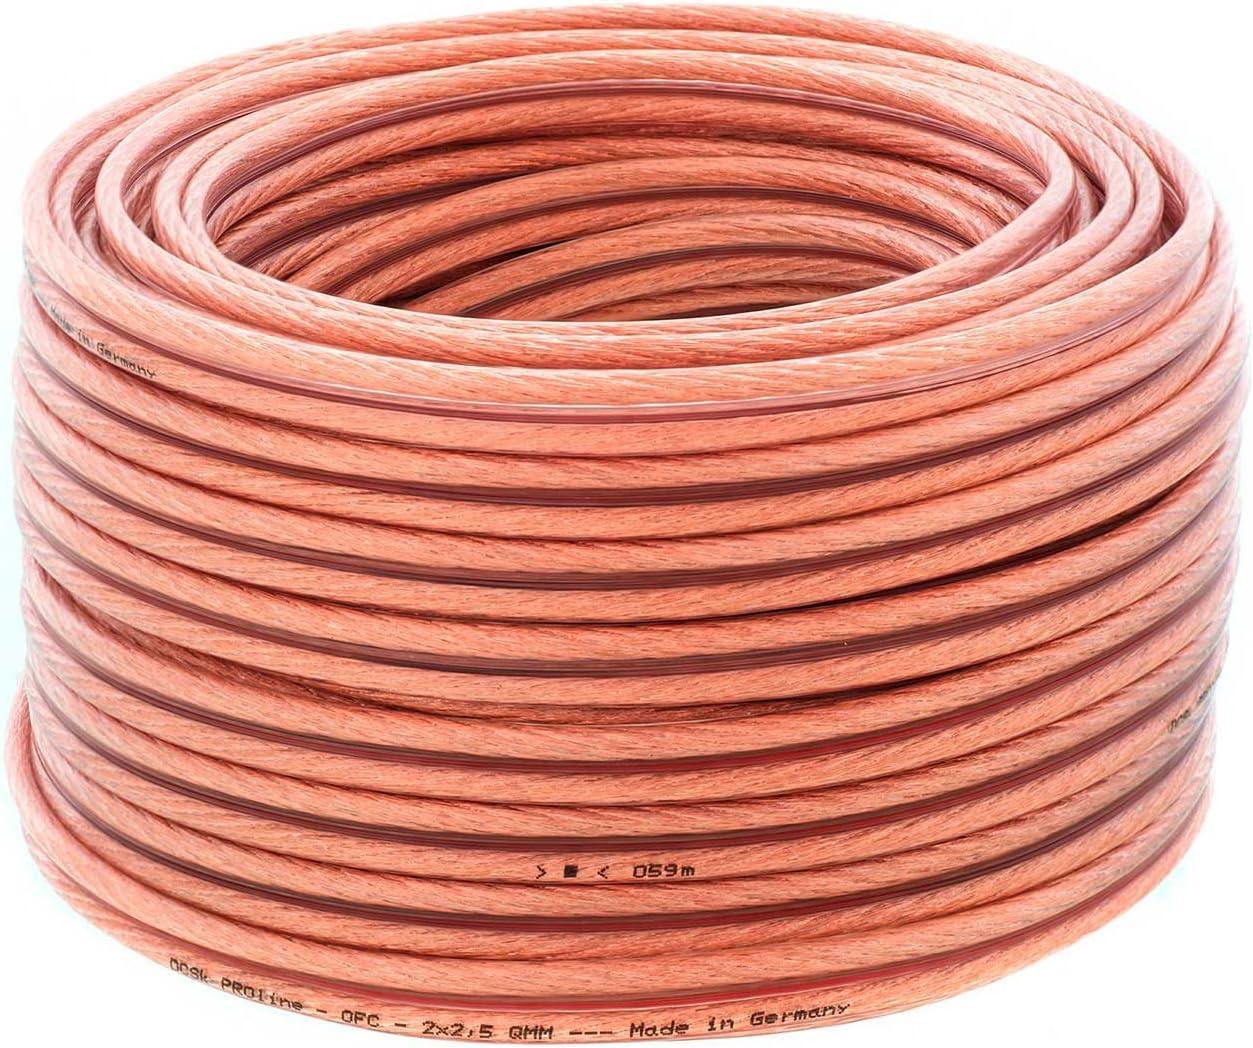 2 x 1,5 mm/² Cable de altavoces plano y blanco I cable de cobre OFC flexible para HiFi//Audio I cable de caja con aislamiento I PROflat 15 DCSk 20m